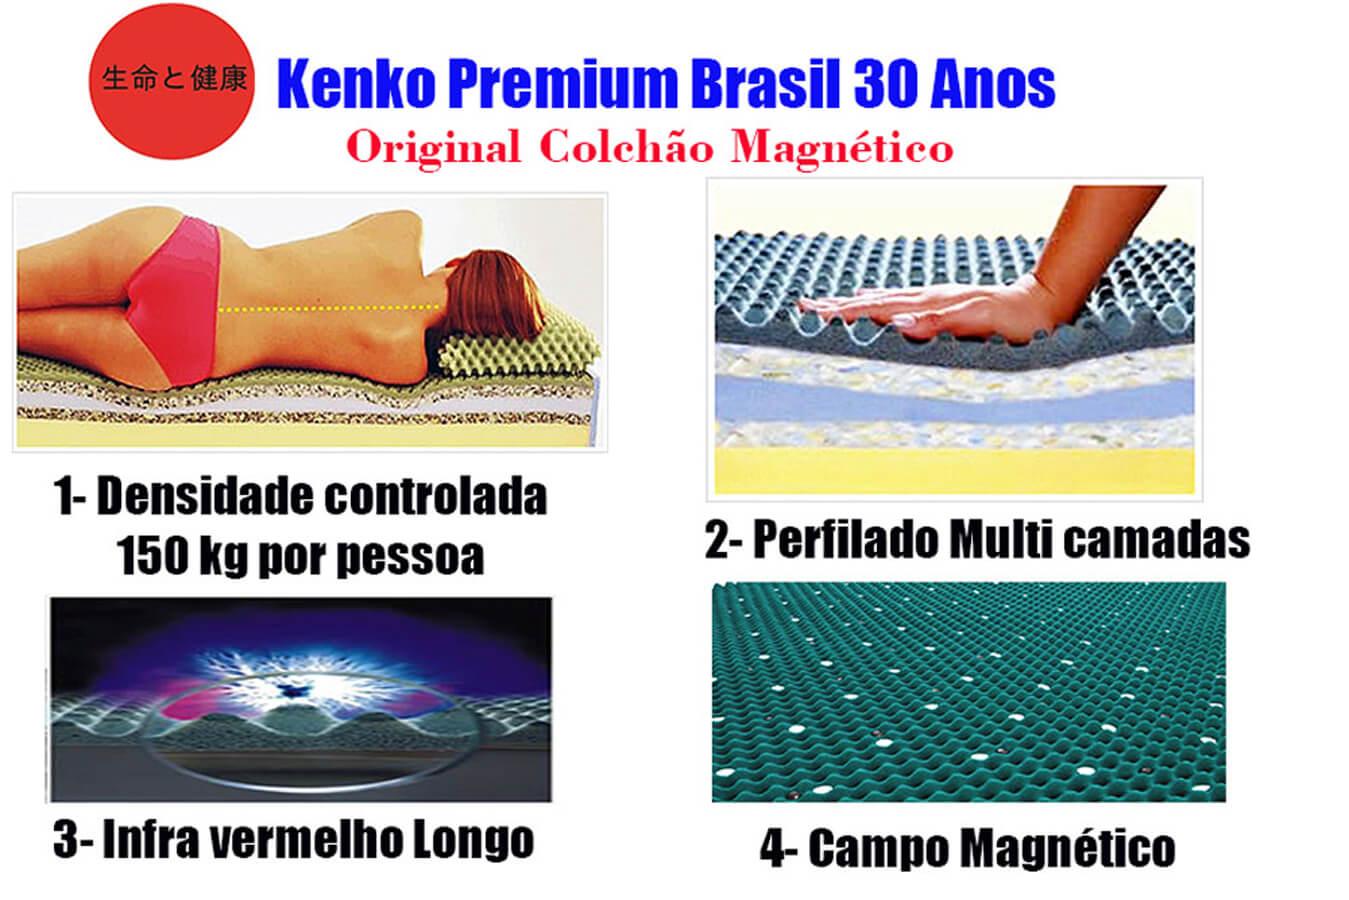 Colchão Magnético Kenko Premium, Modelo HR 29cm Látex - Casal 1,38x1,88  - Kenko Premium Colchões